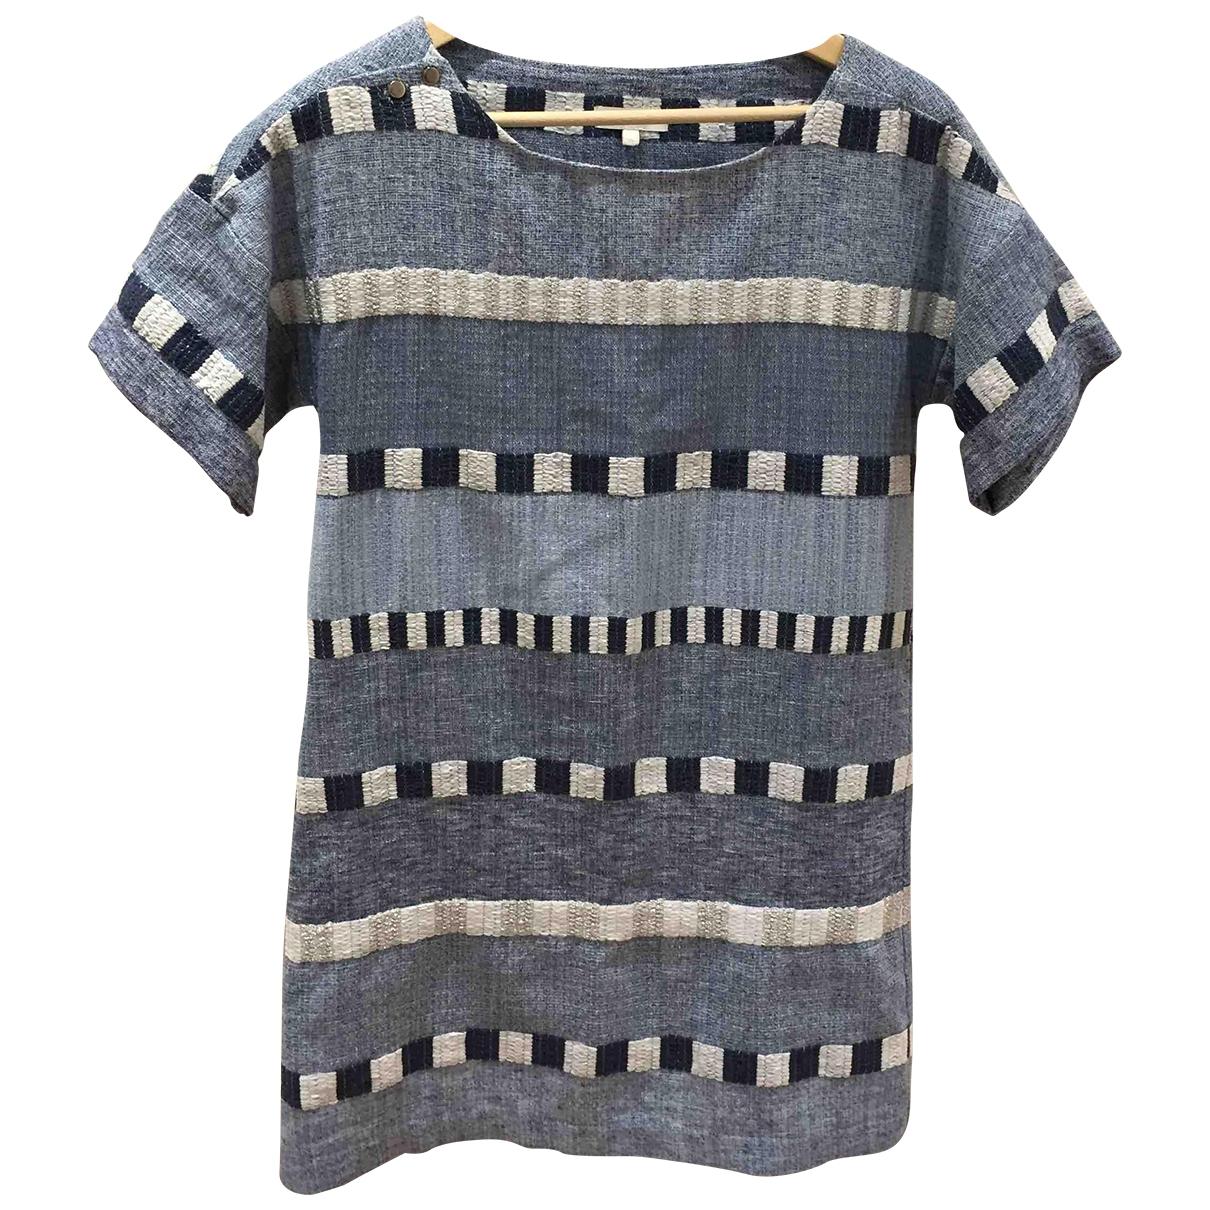 Hoss Intropia \N Blue Cotton dress for Women 34 FR